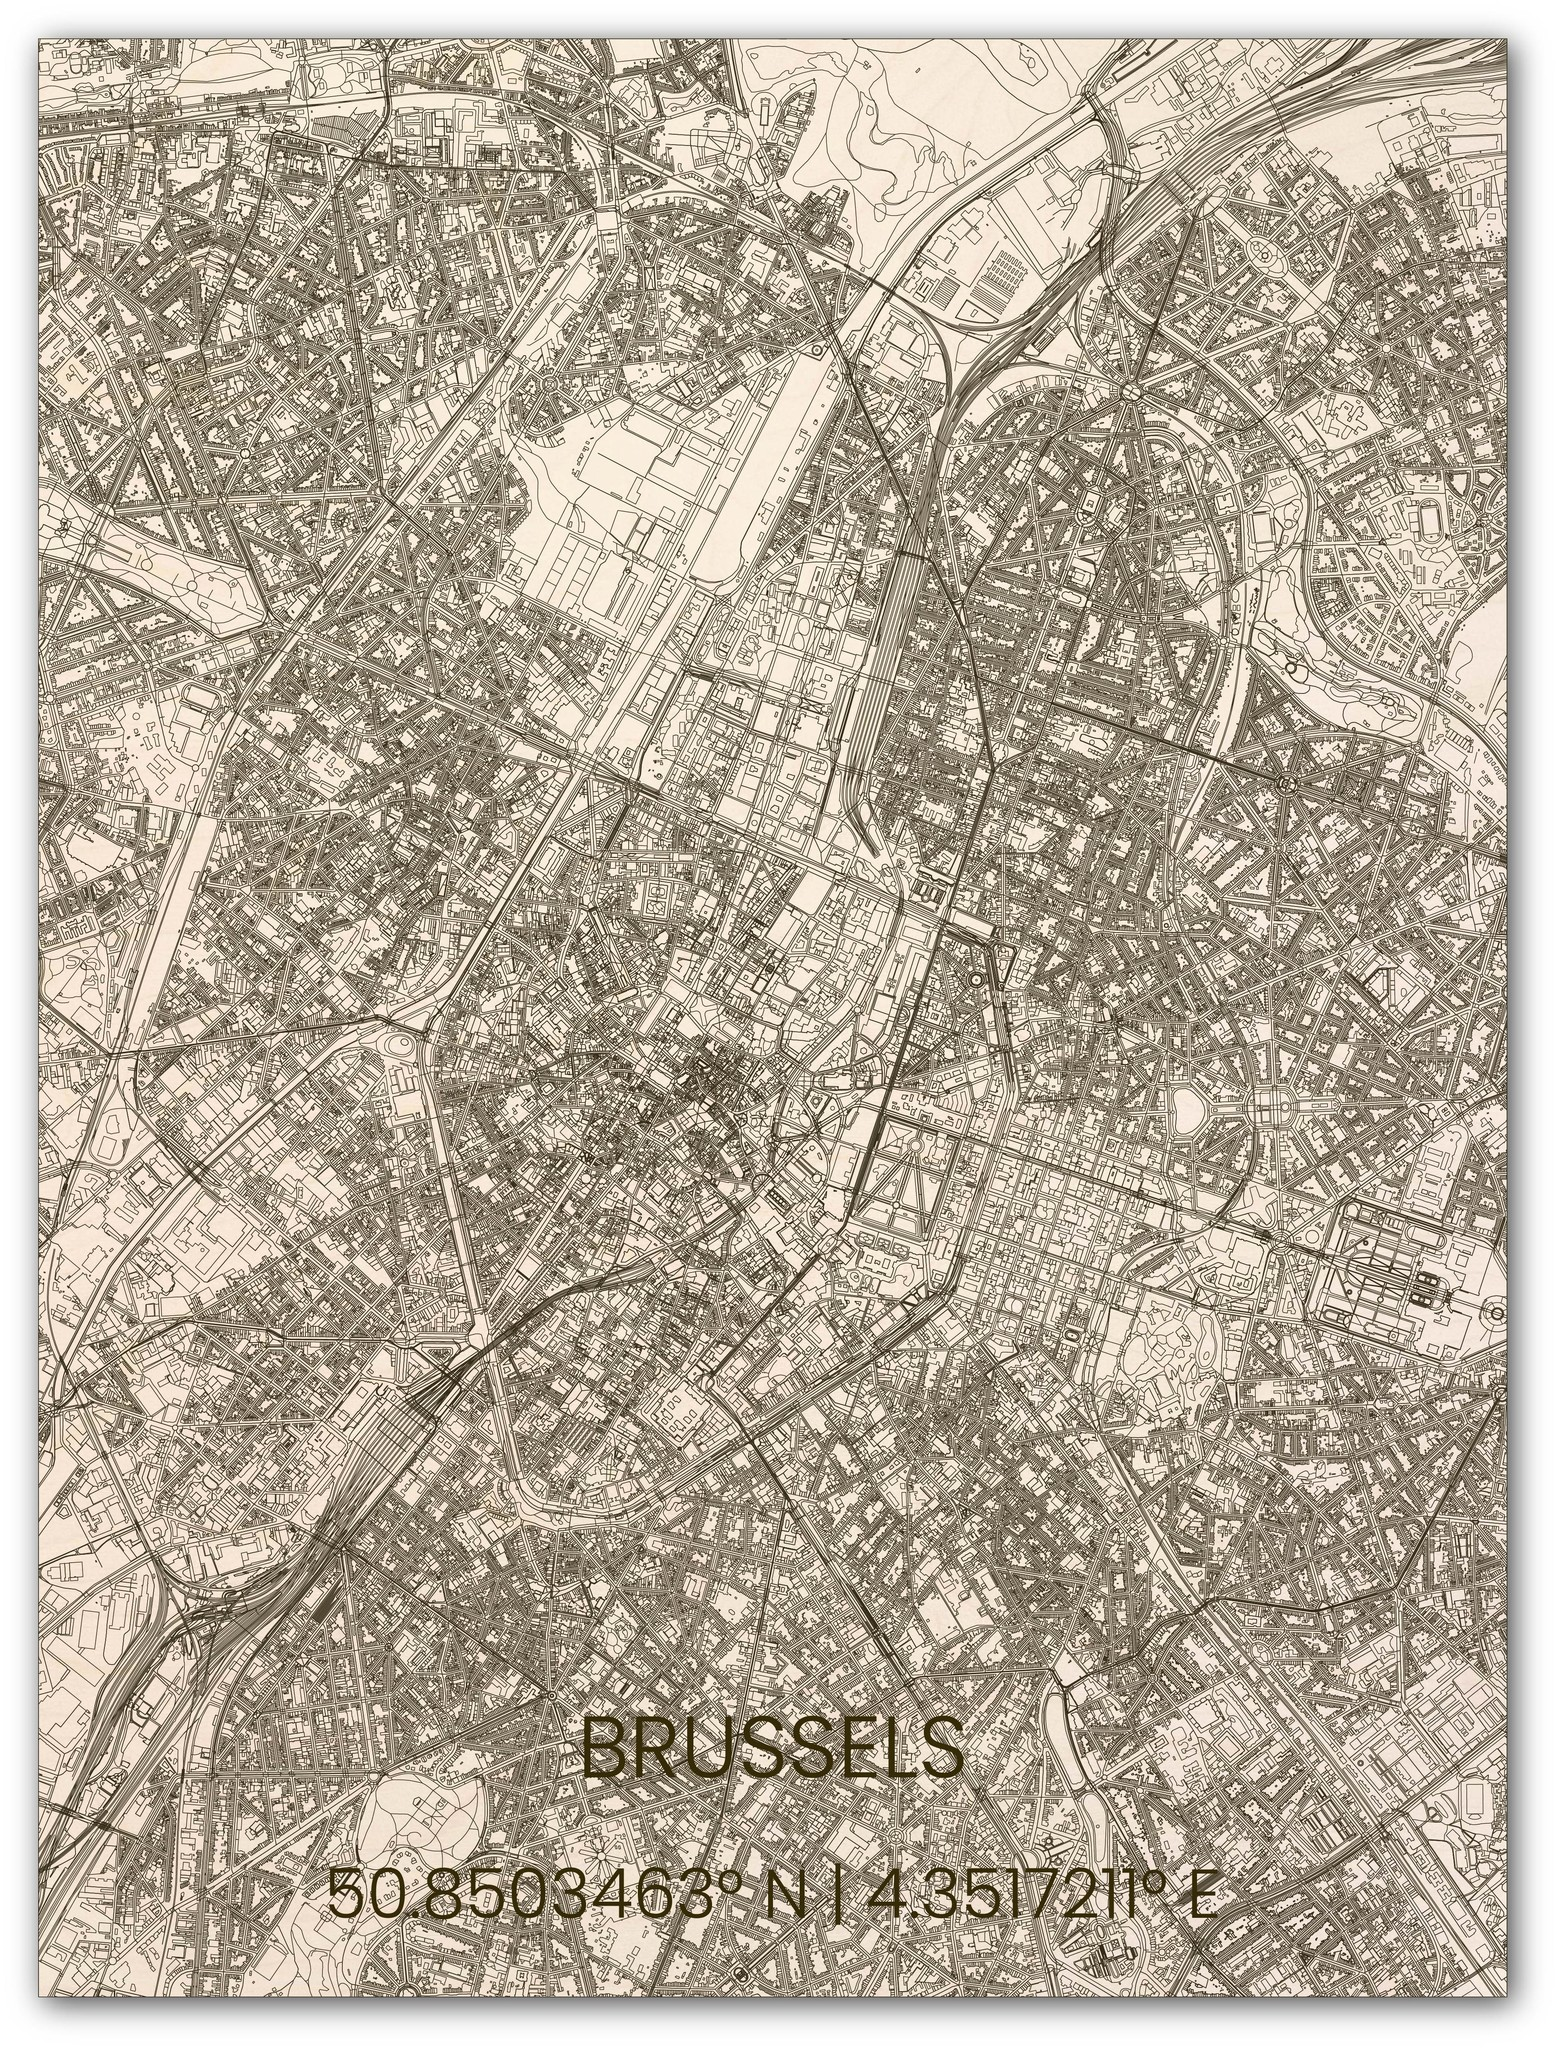 Houten stadsplattegrond Brussel-1